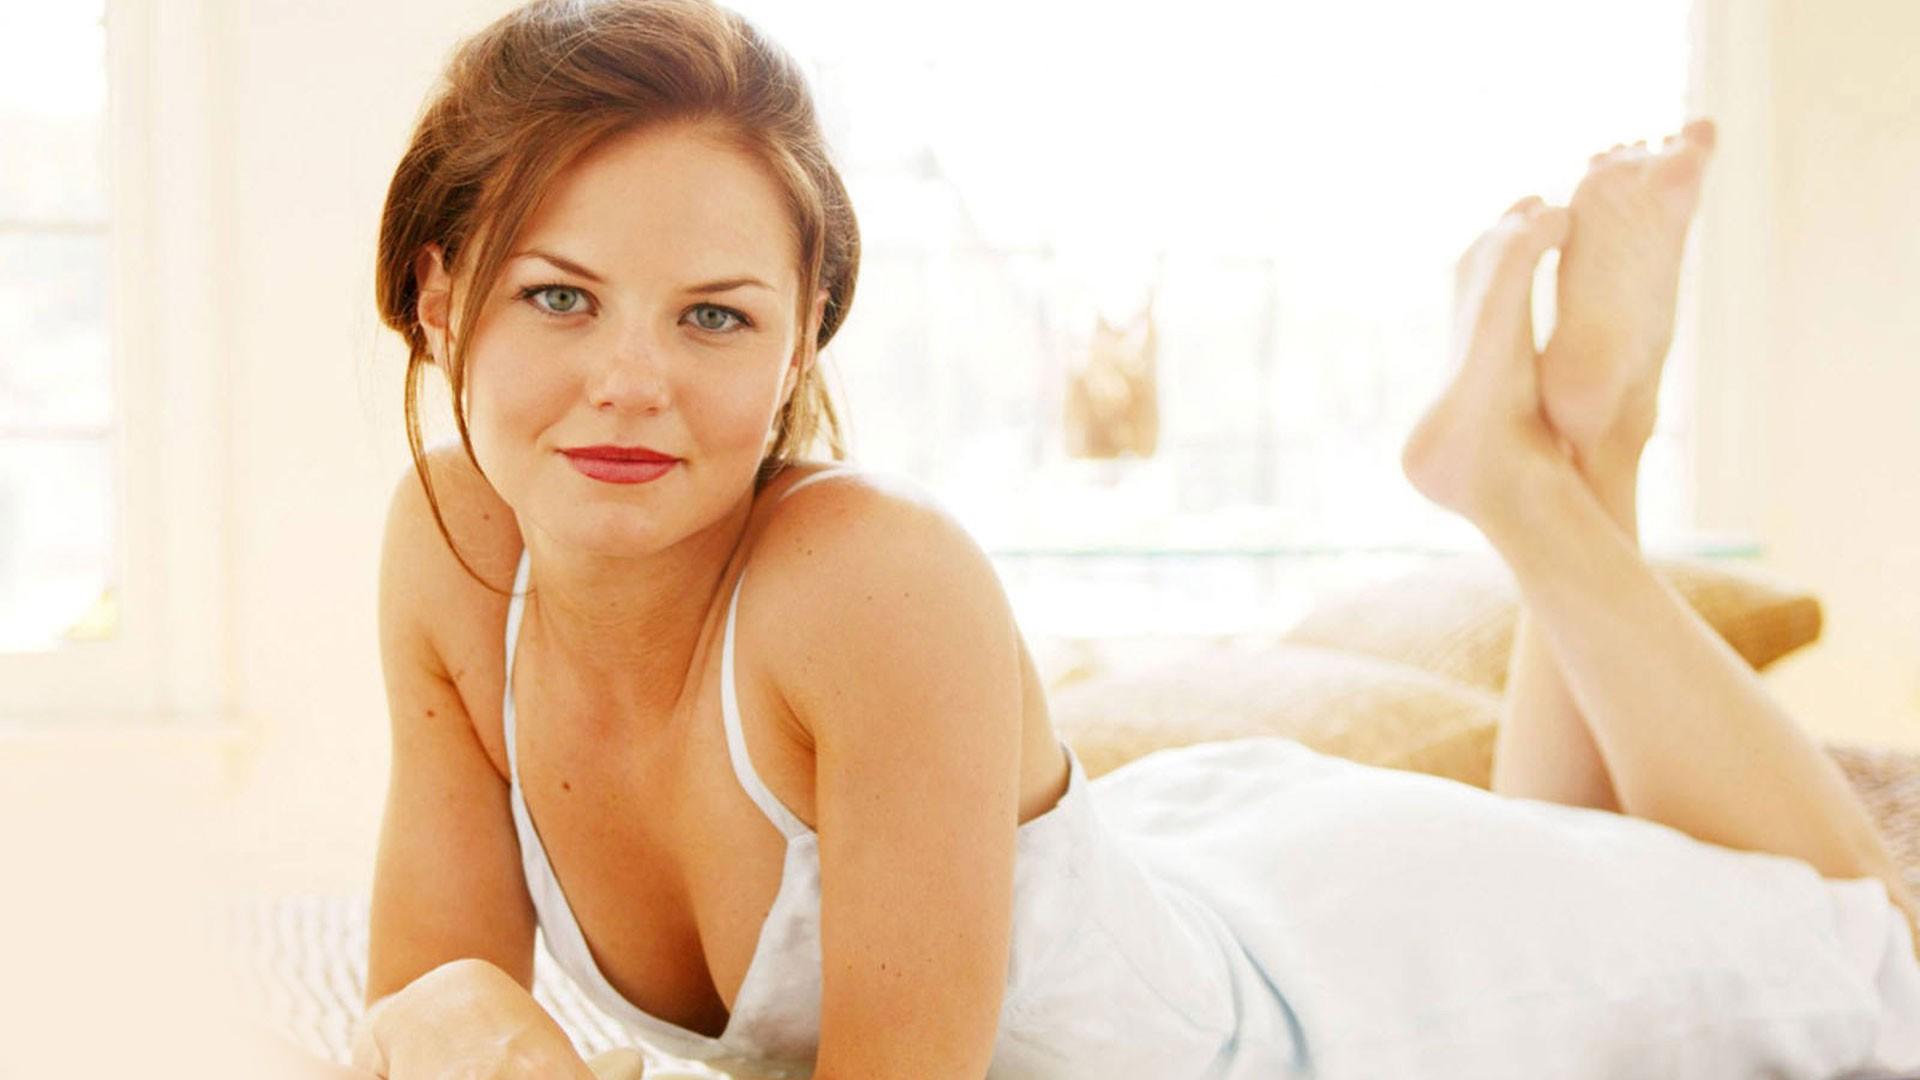 Jennifer Morrison Widescreen